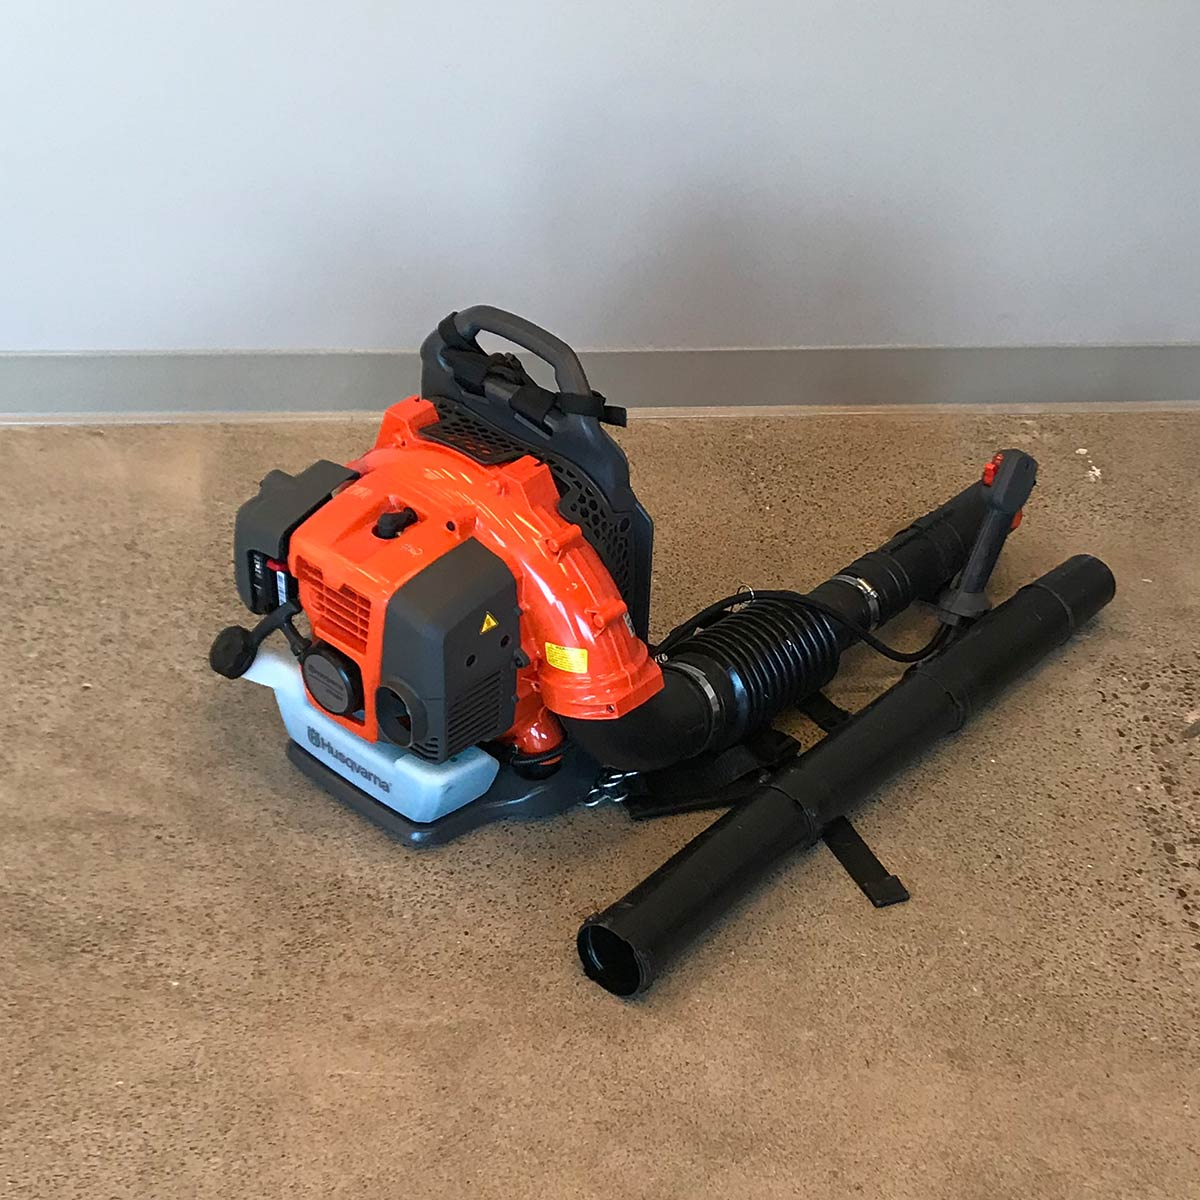 Husqvarna Blower Backpack Gas Powered 350BT (5)